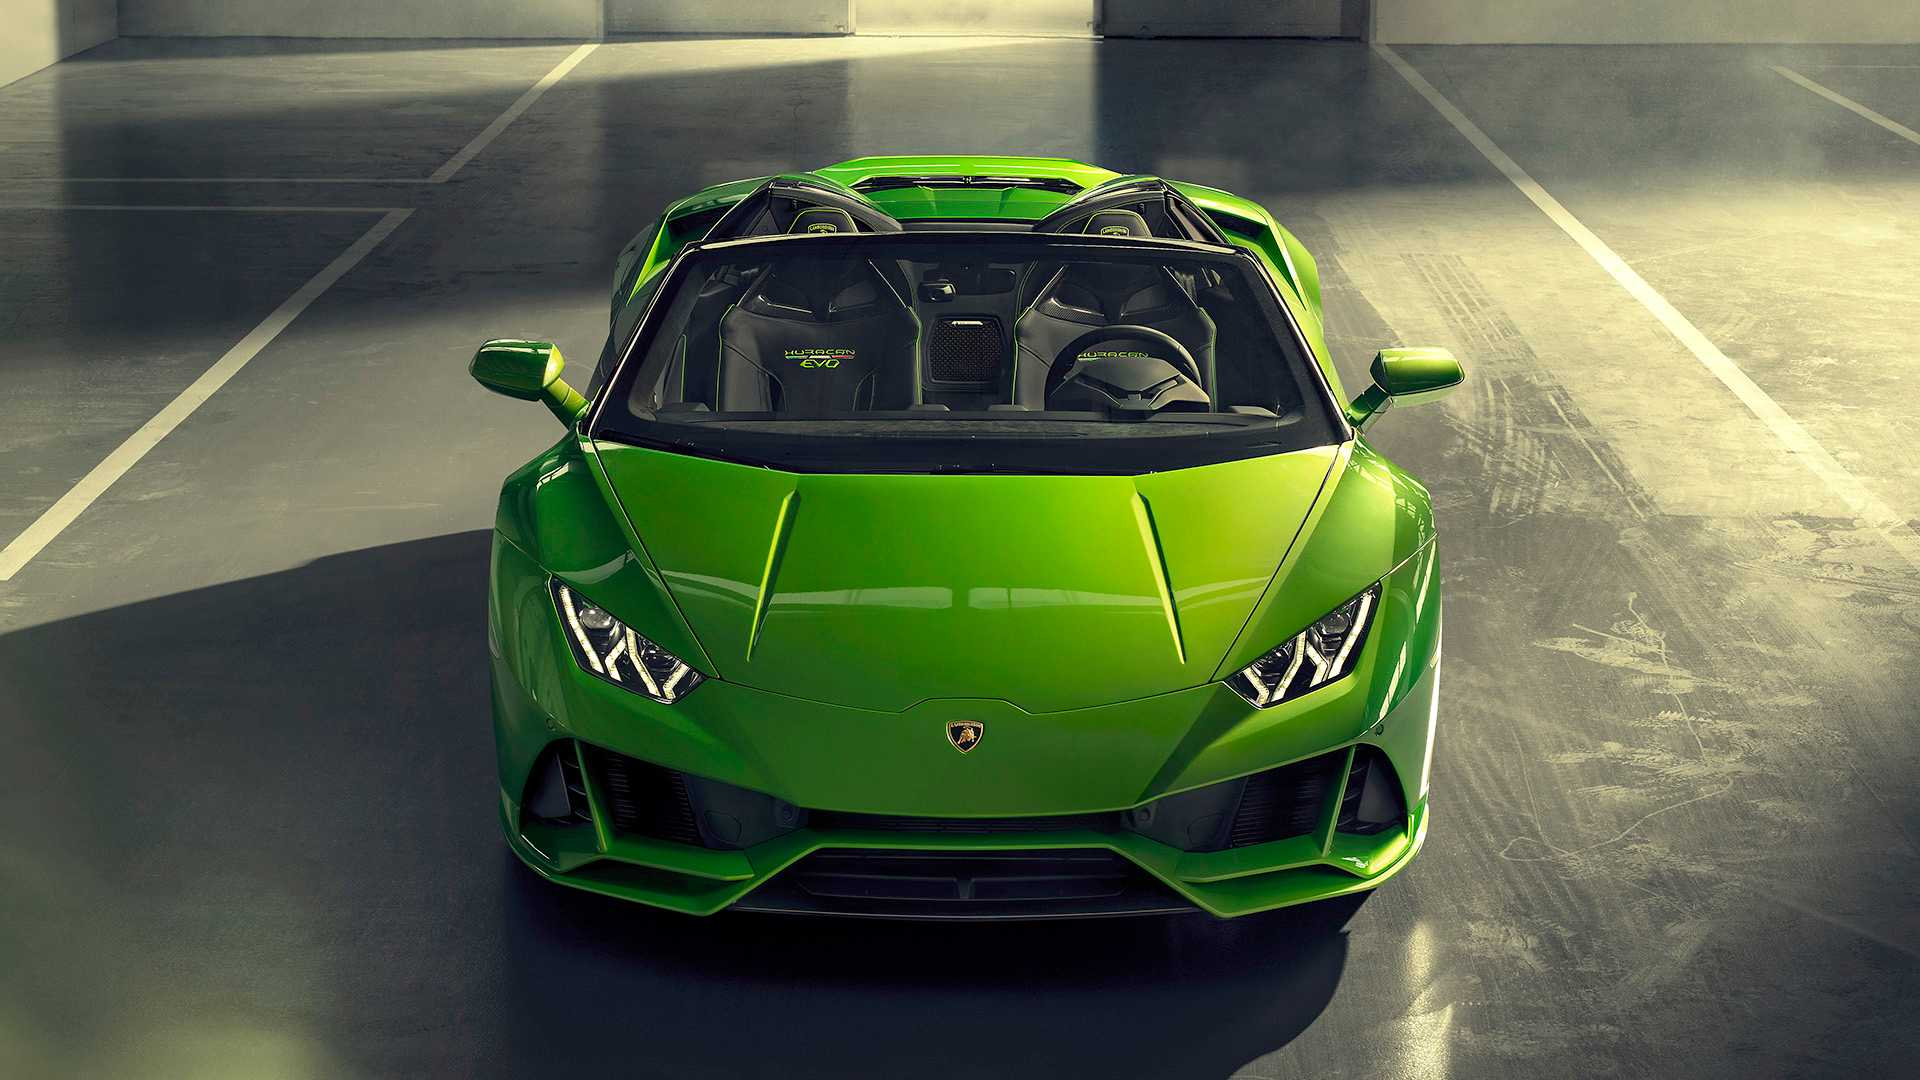 2019 Lamborghini Huracán EVO Spyder Front Wallpaper (12)